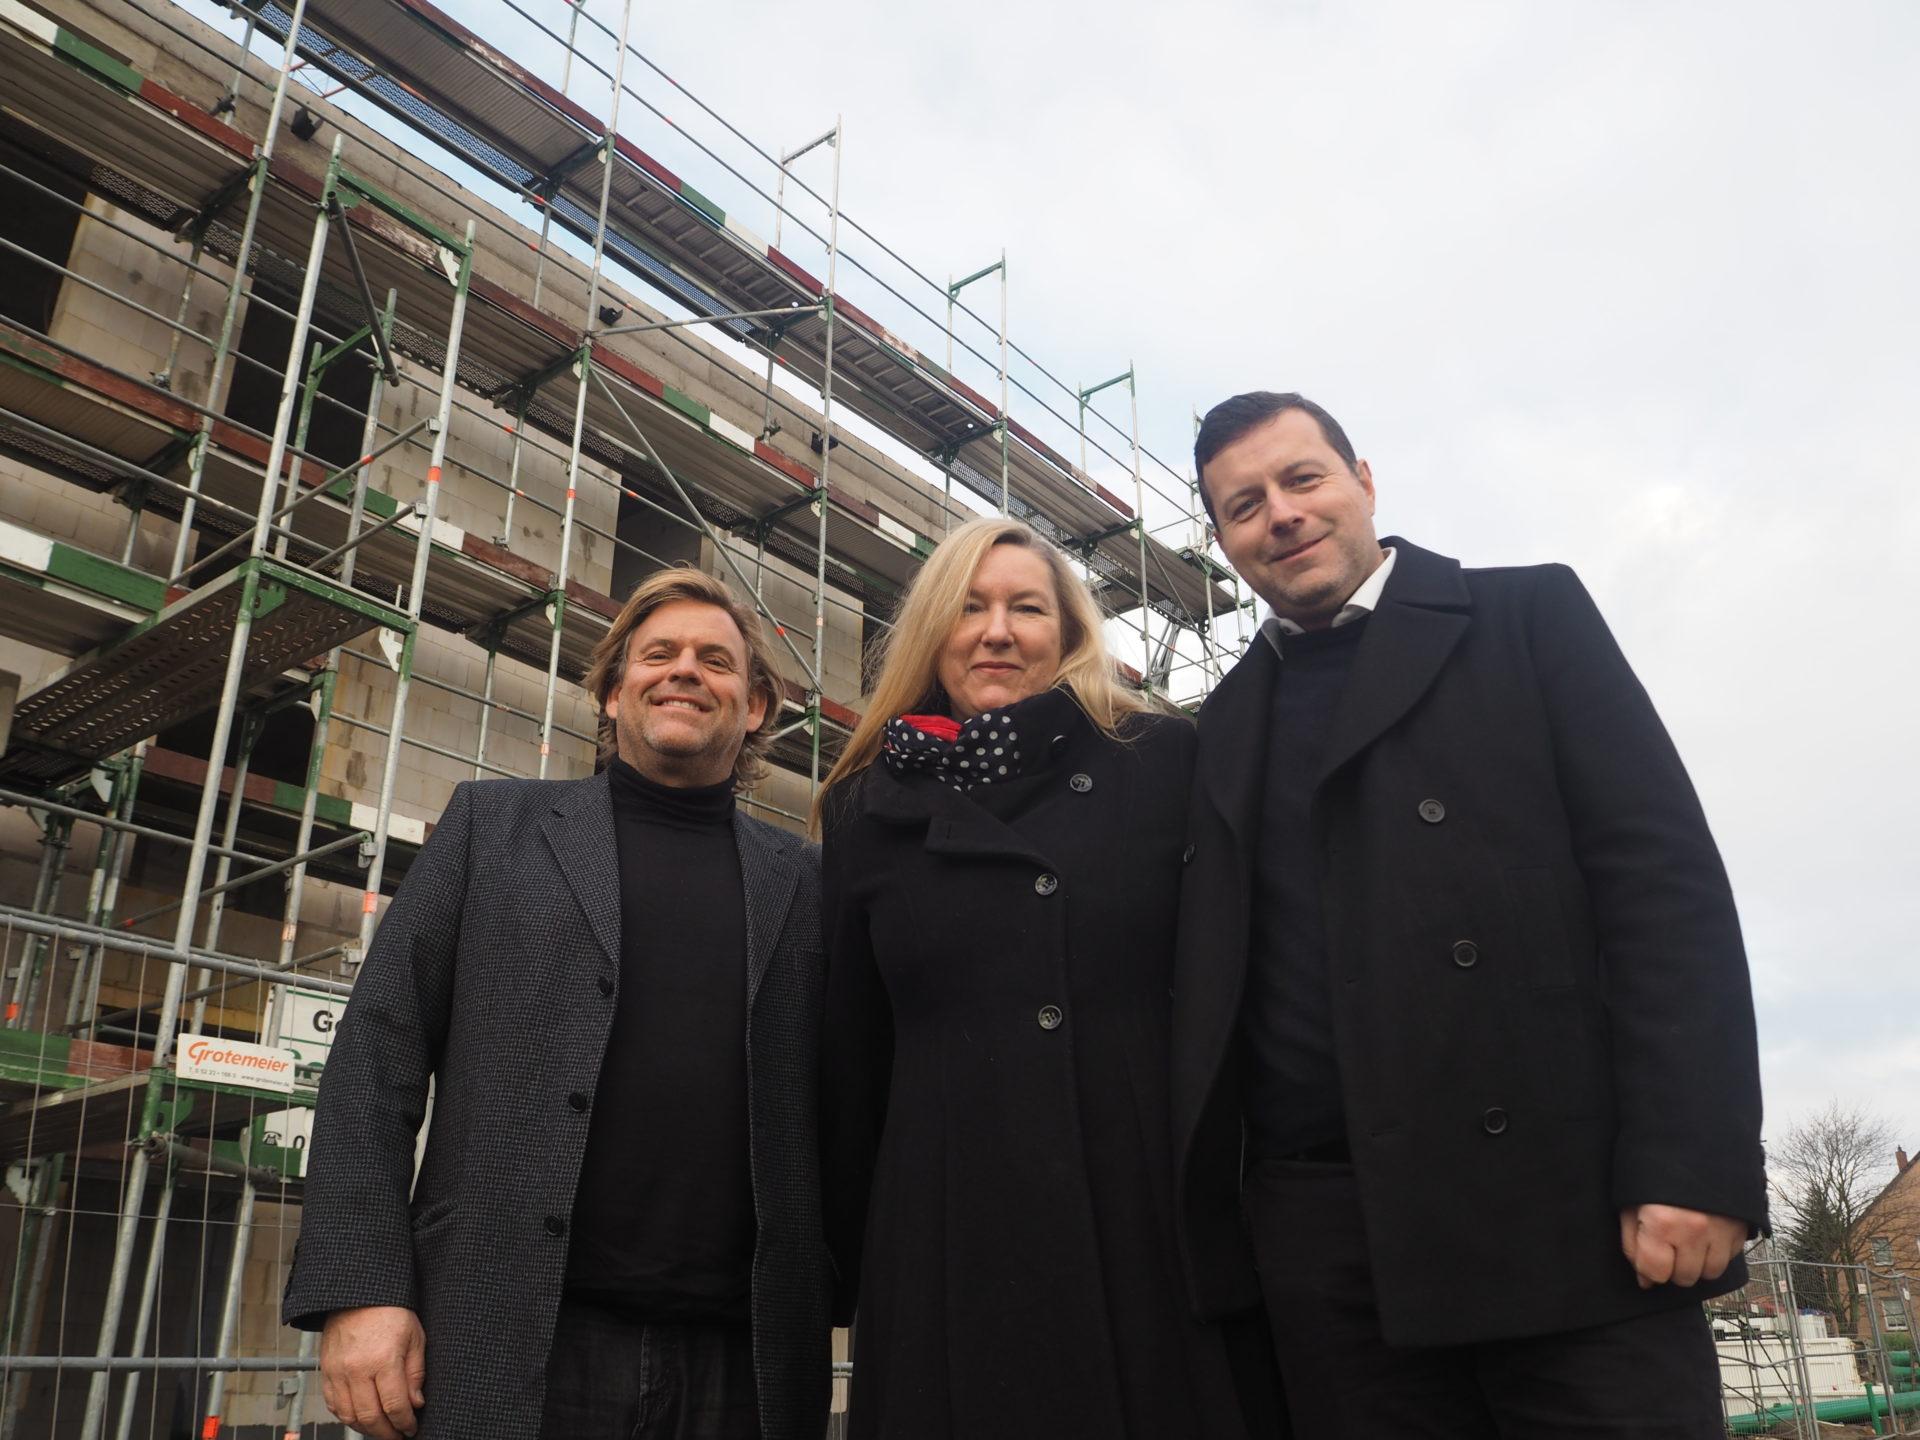 Tom Mögele, Manuela Tarbiat-Wündsch und Bernhard Keller